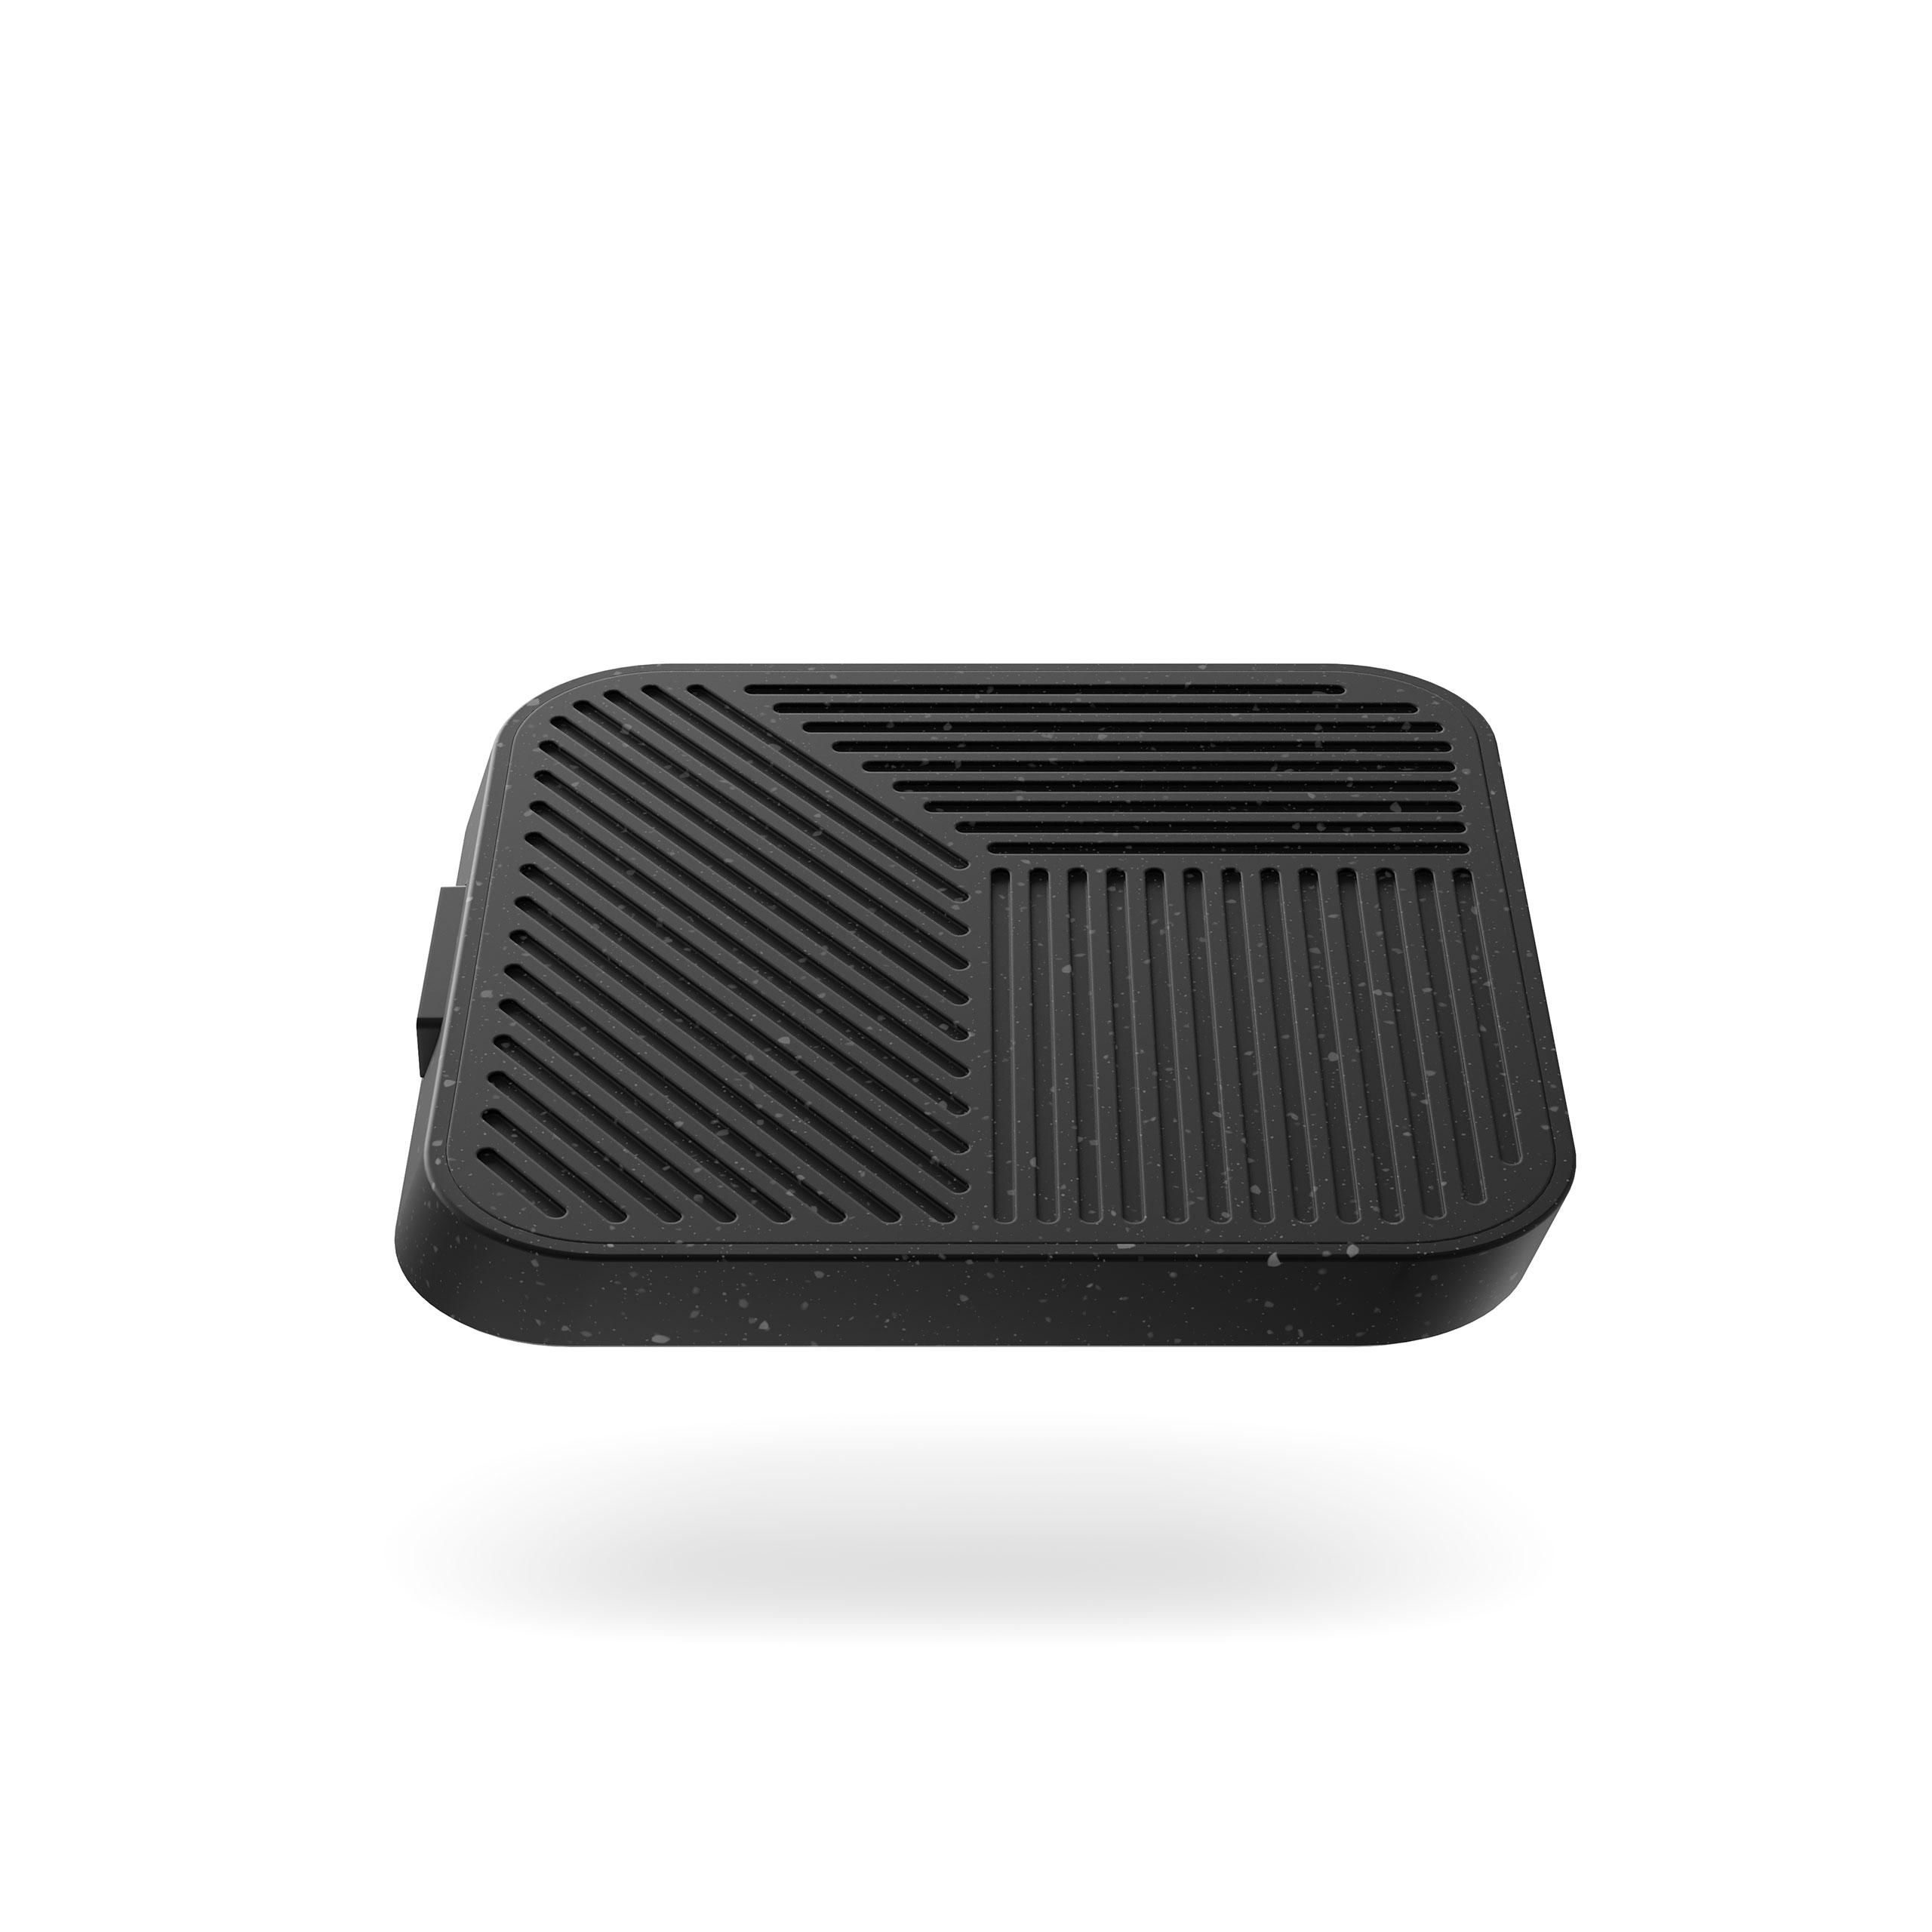 ZEMSC01A Zens Modular Single Wireless Charger Extension Front View